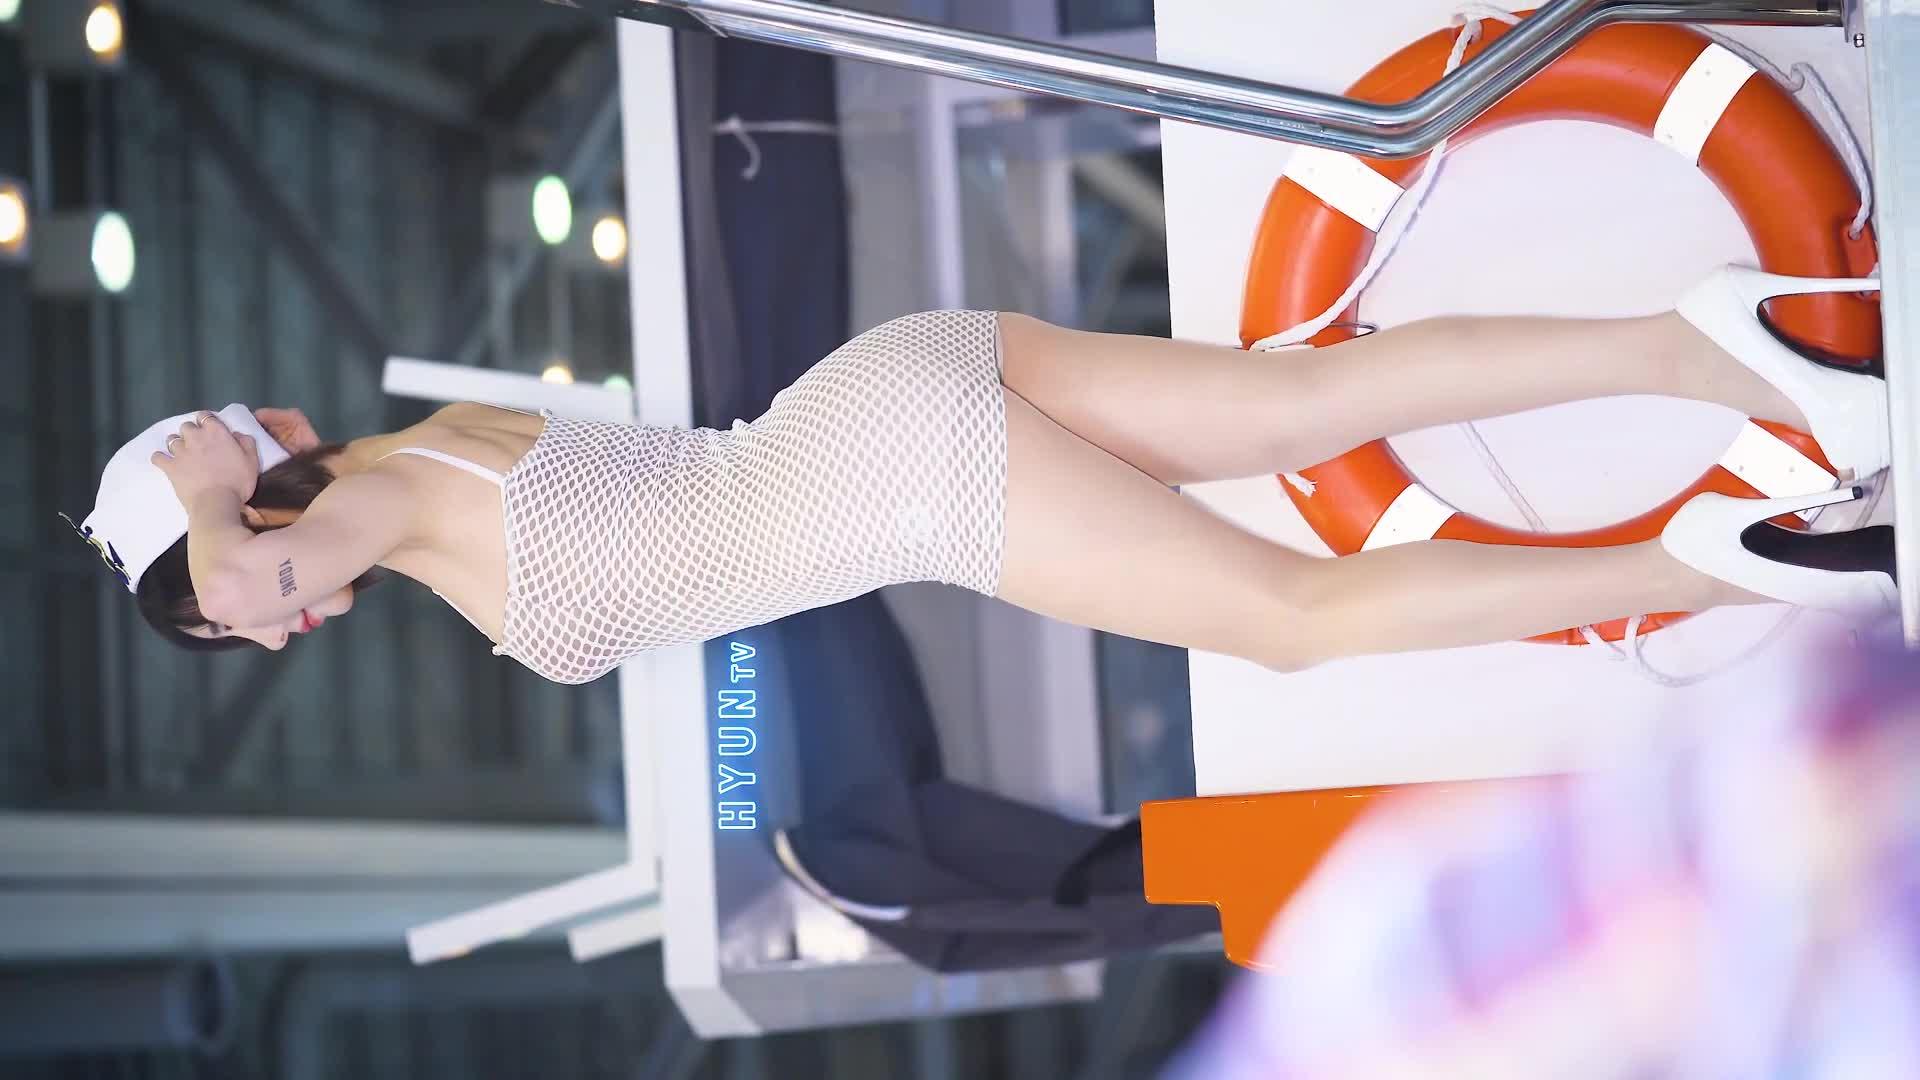 4k  지배자 of 보트쇼!! 송주아 Song Jua  the Korean Model (2021 부산국제보트쇼 210423) 직캠 Fancam by Hyuntv 현티비